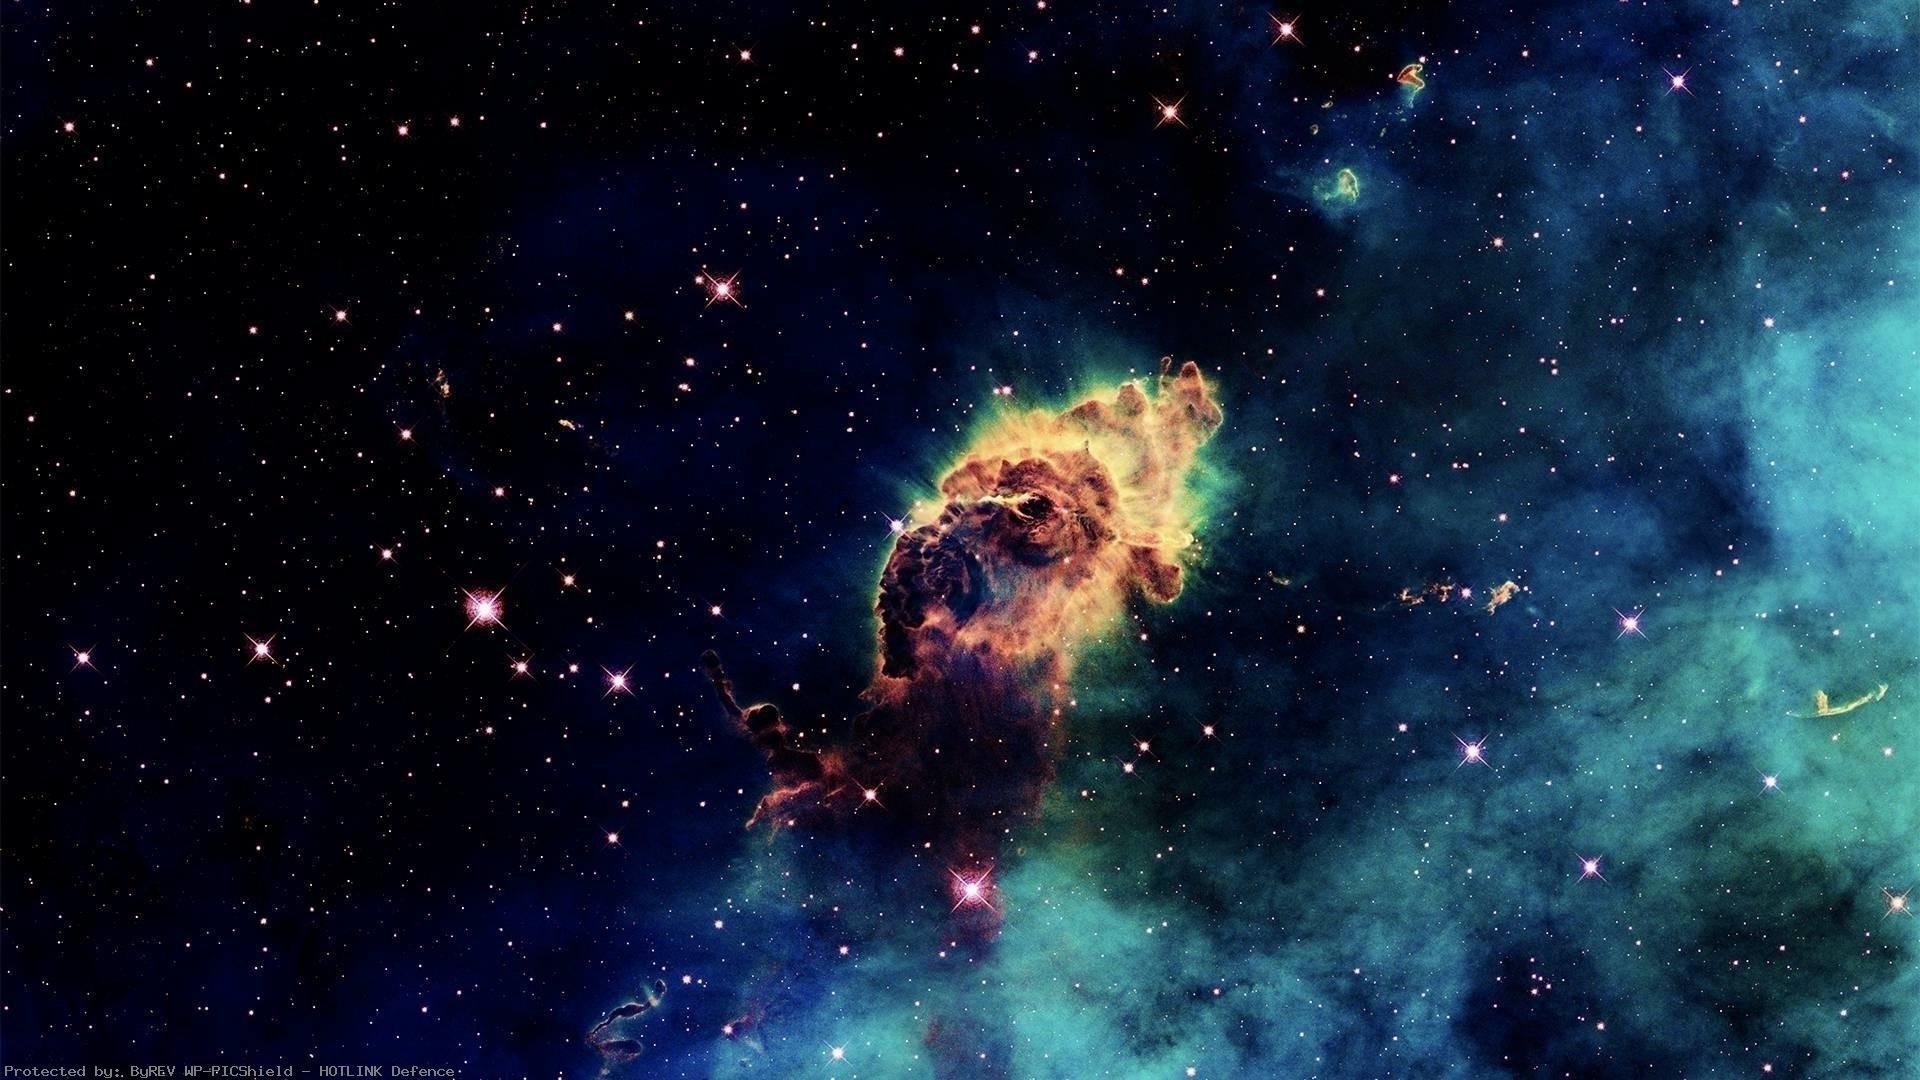 Universe-Stars-Hd-wallpaper-wp60013278